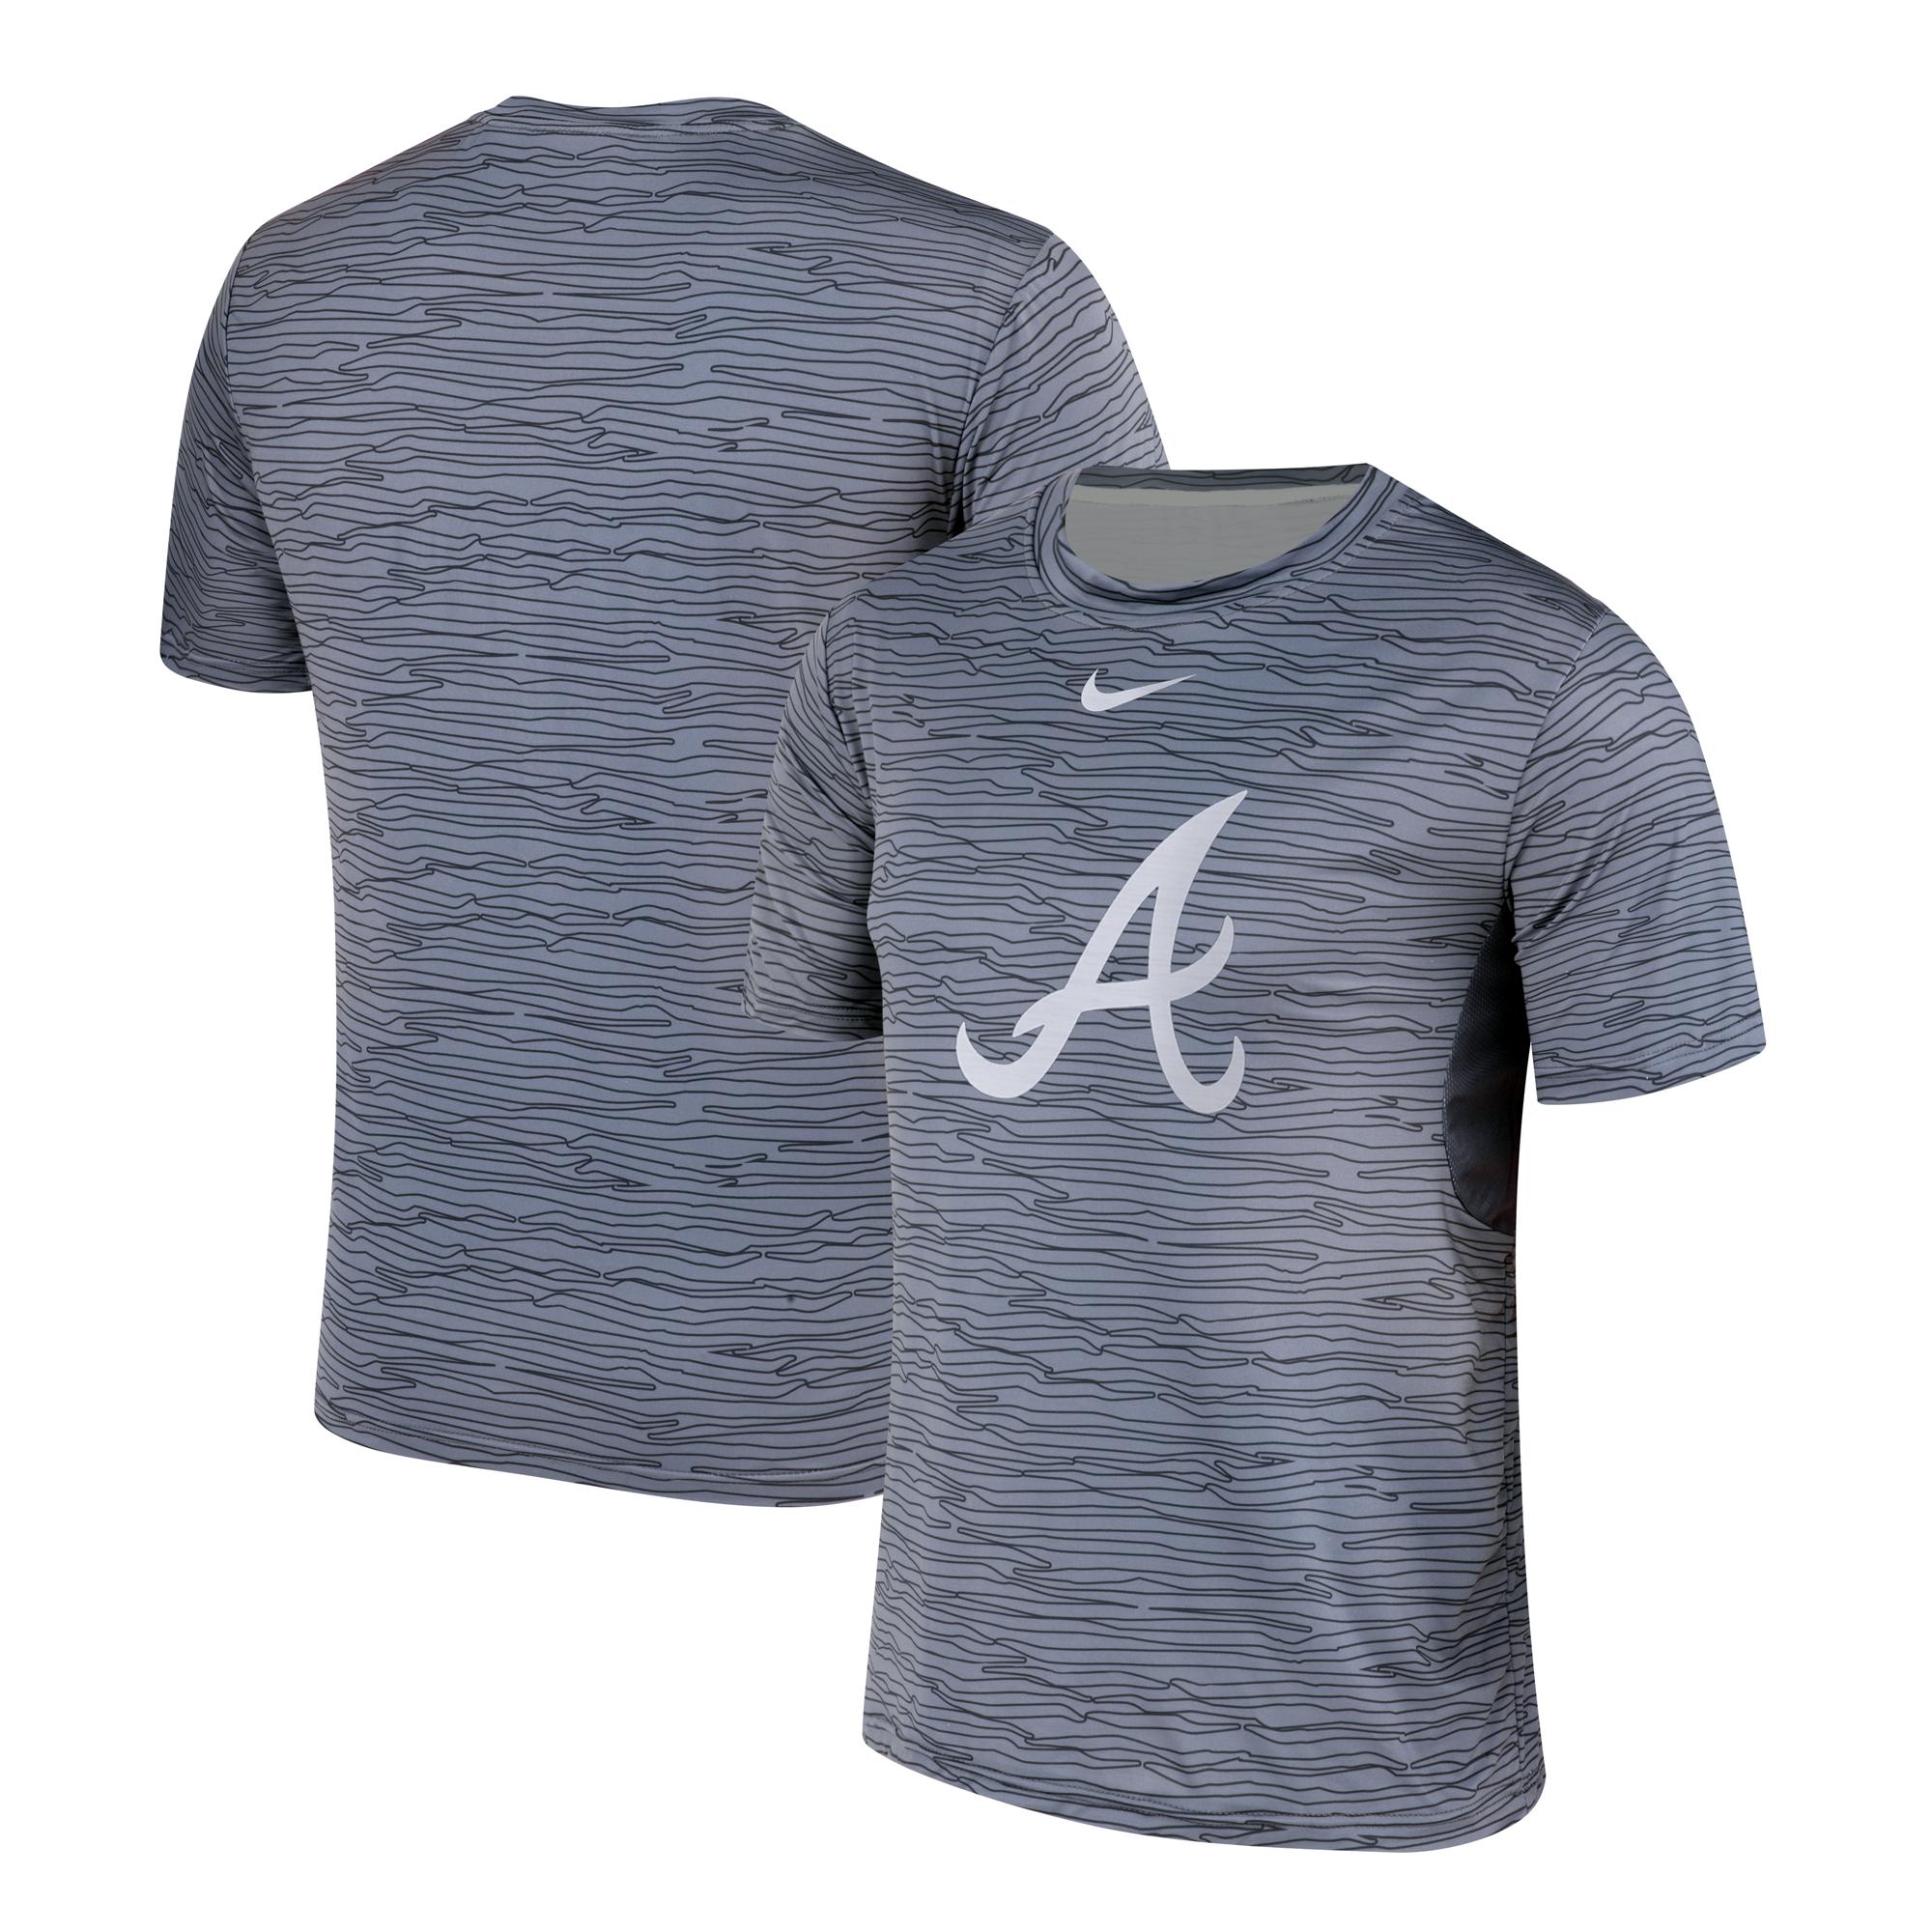 Nike Atlanta Braves Gray Black Striped Logo Performance T-Shirt